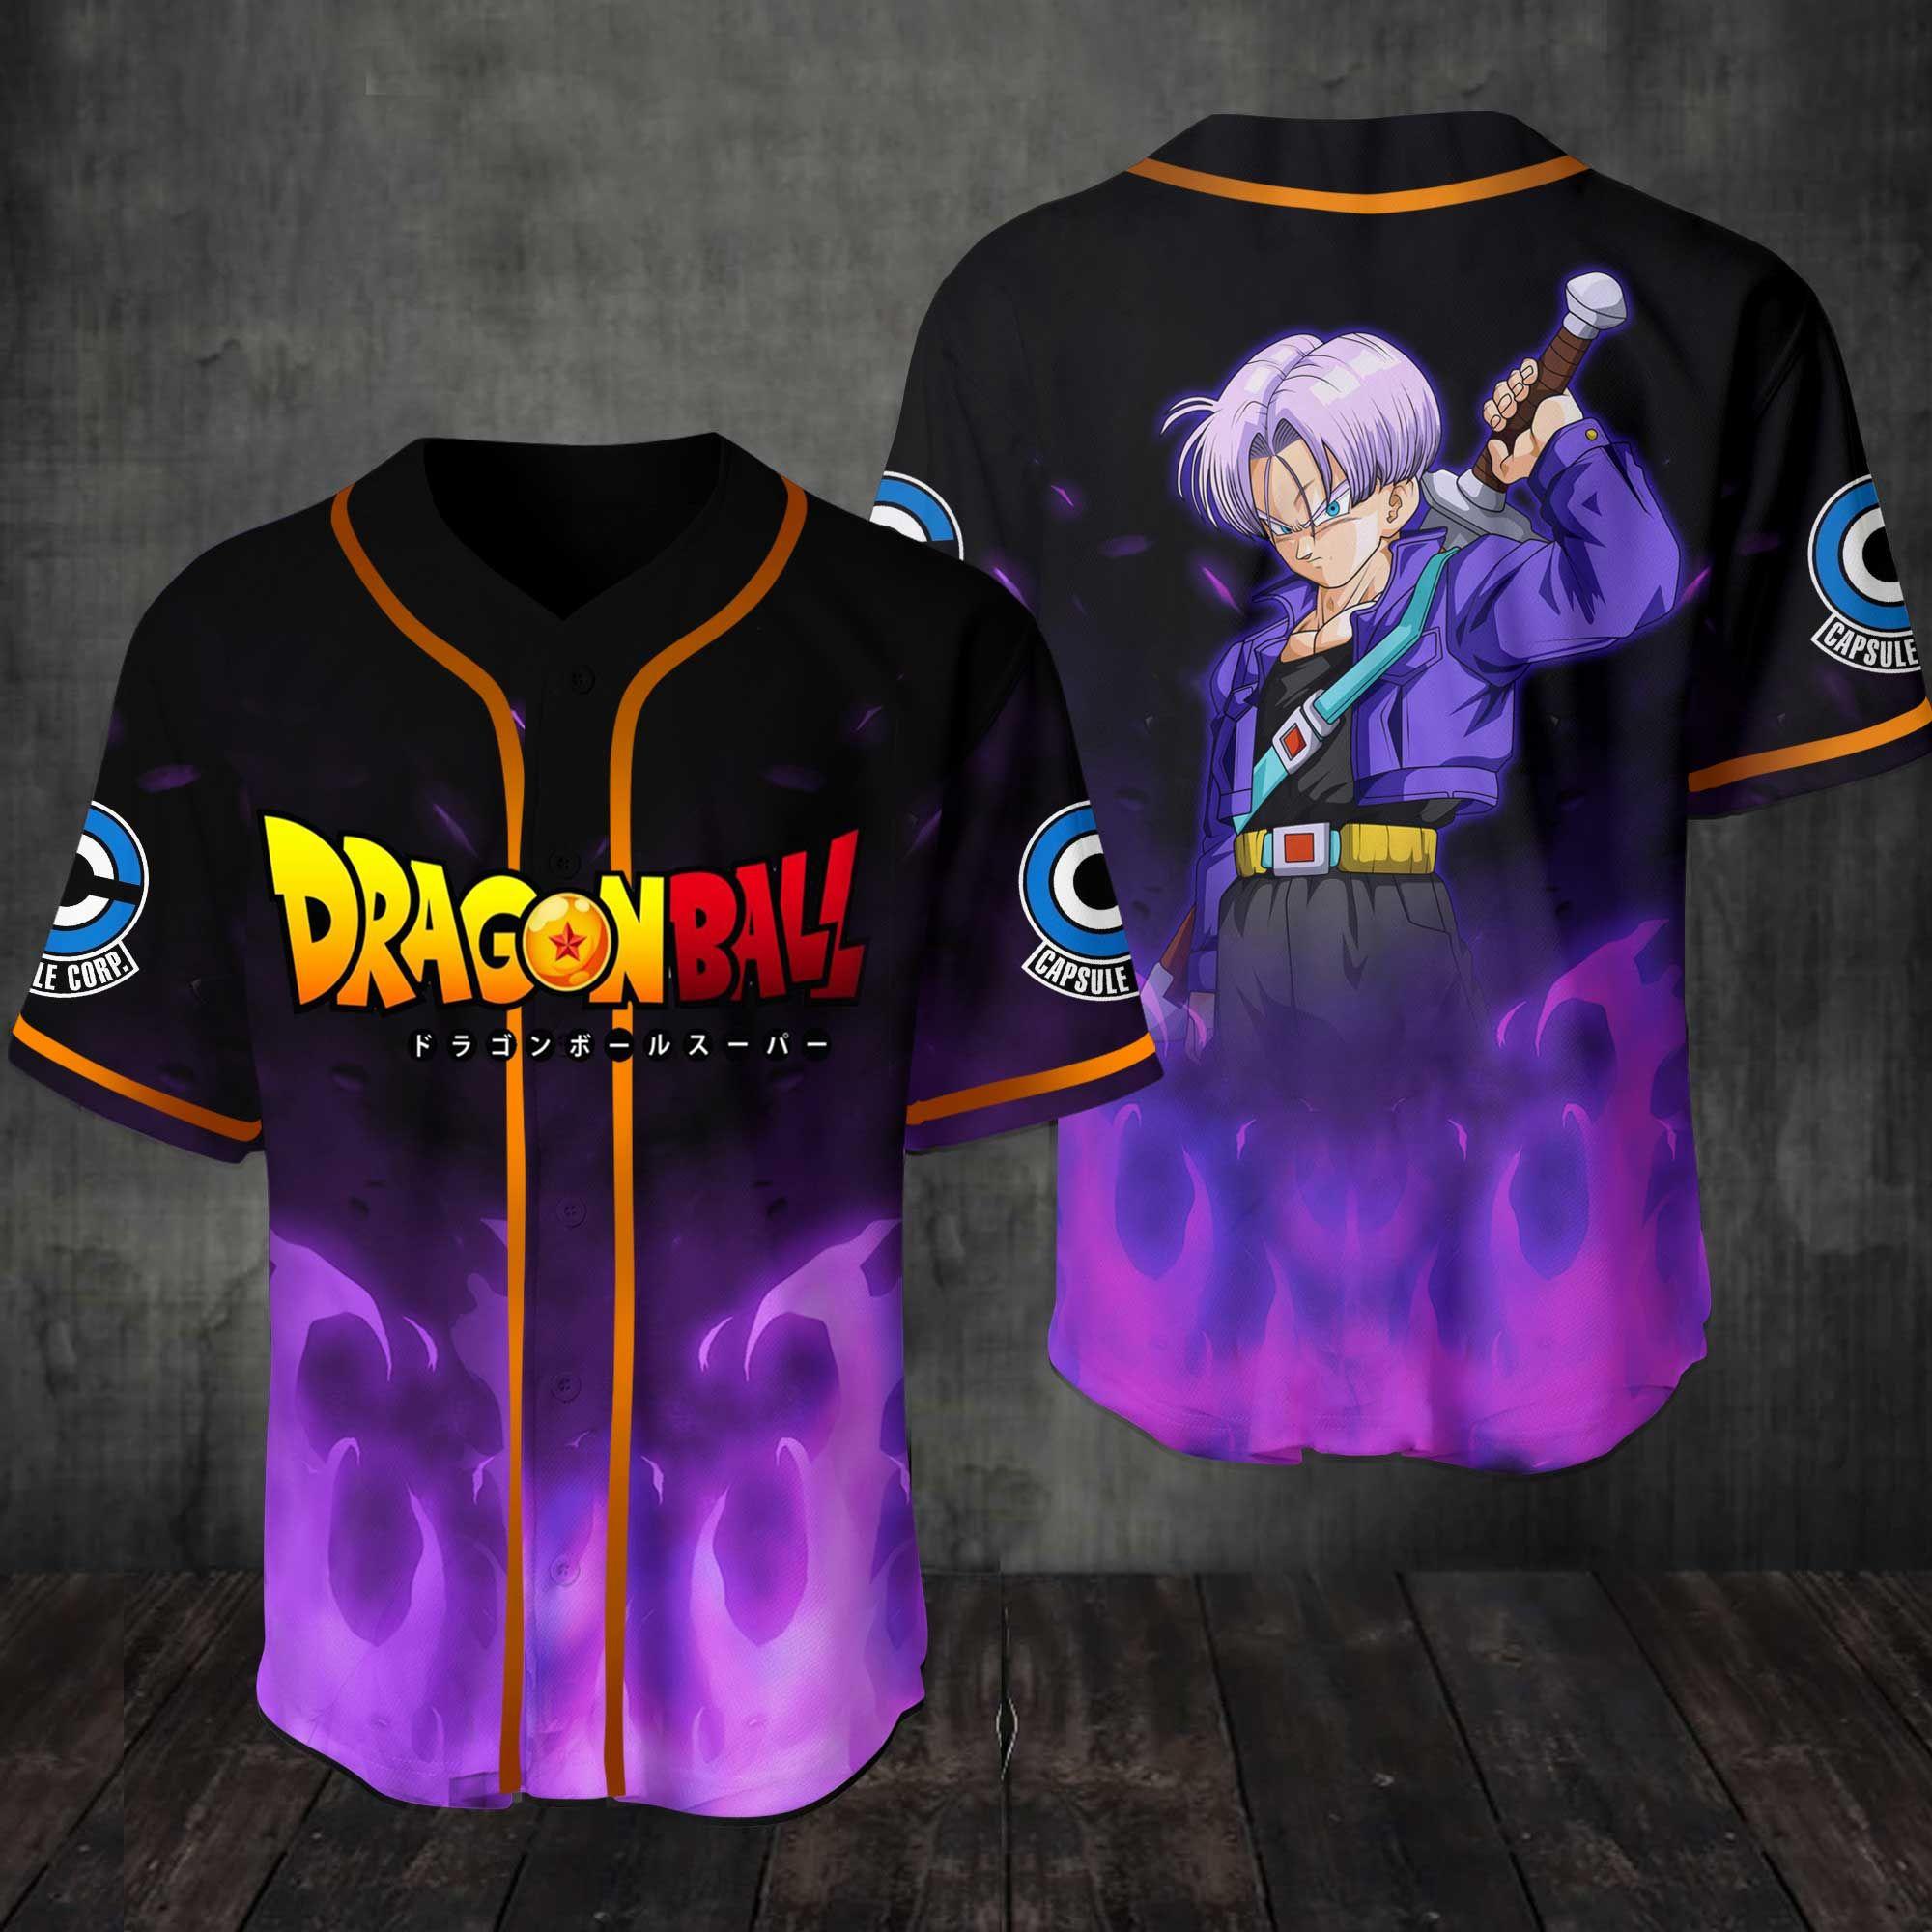 Dragon Ball Trunks Baseball Jersey Shirt